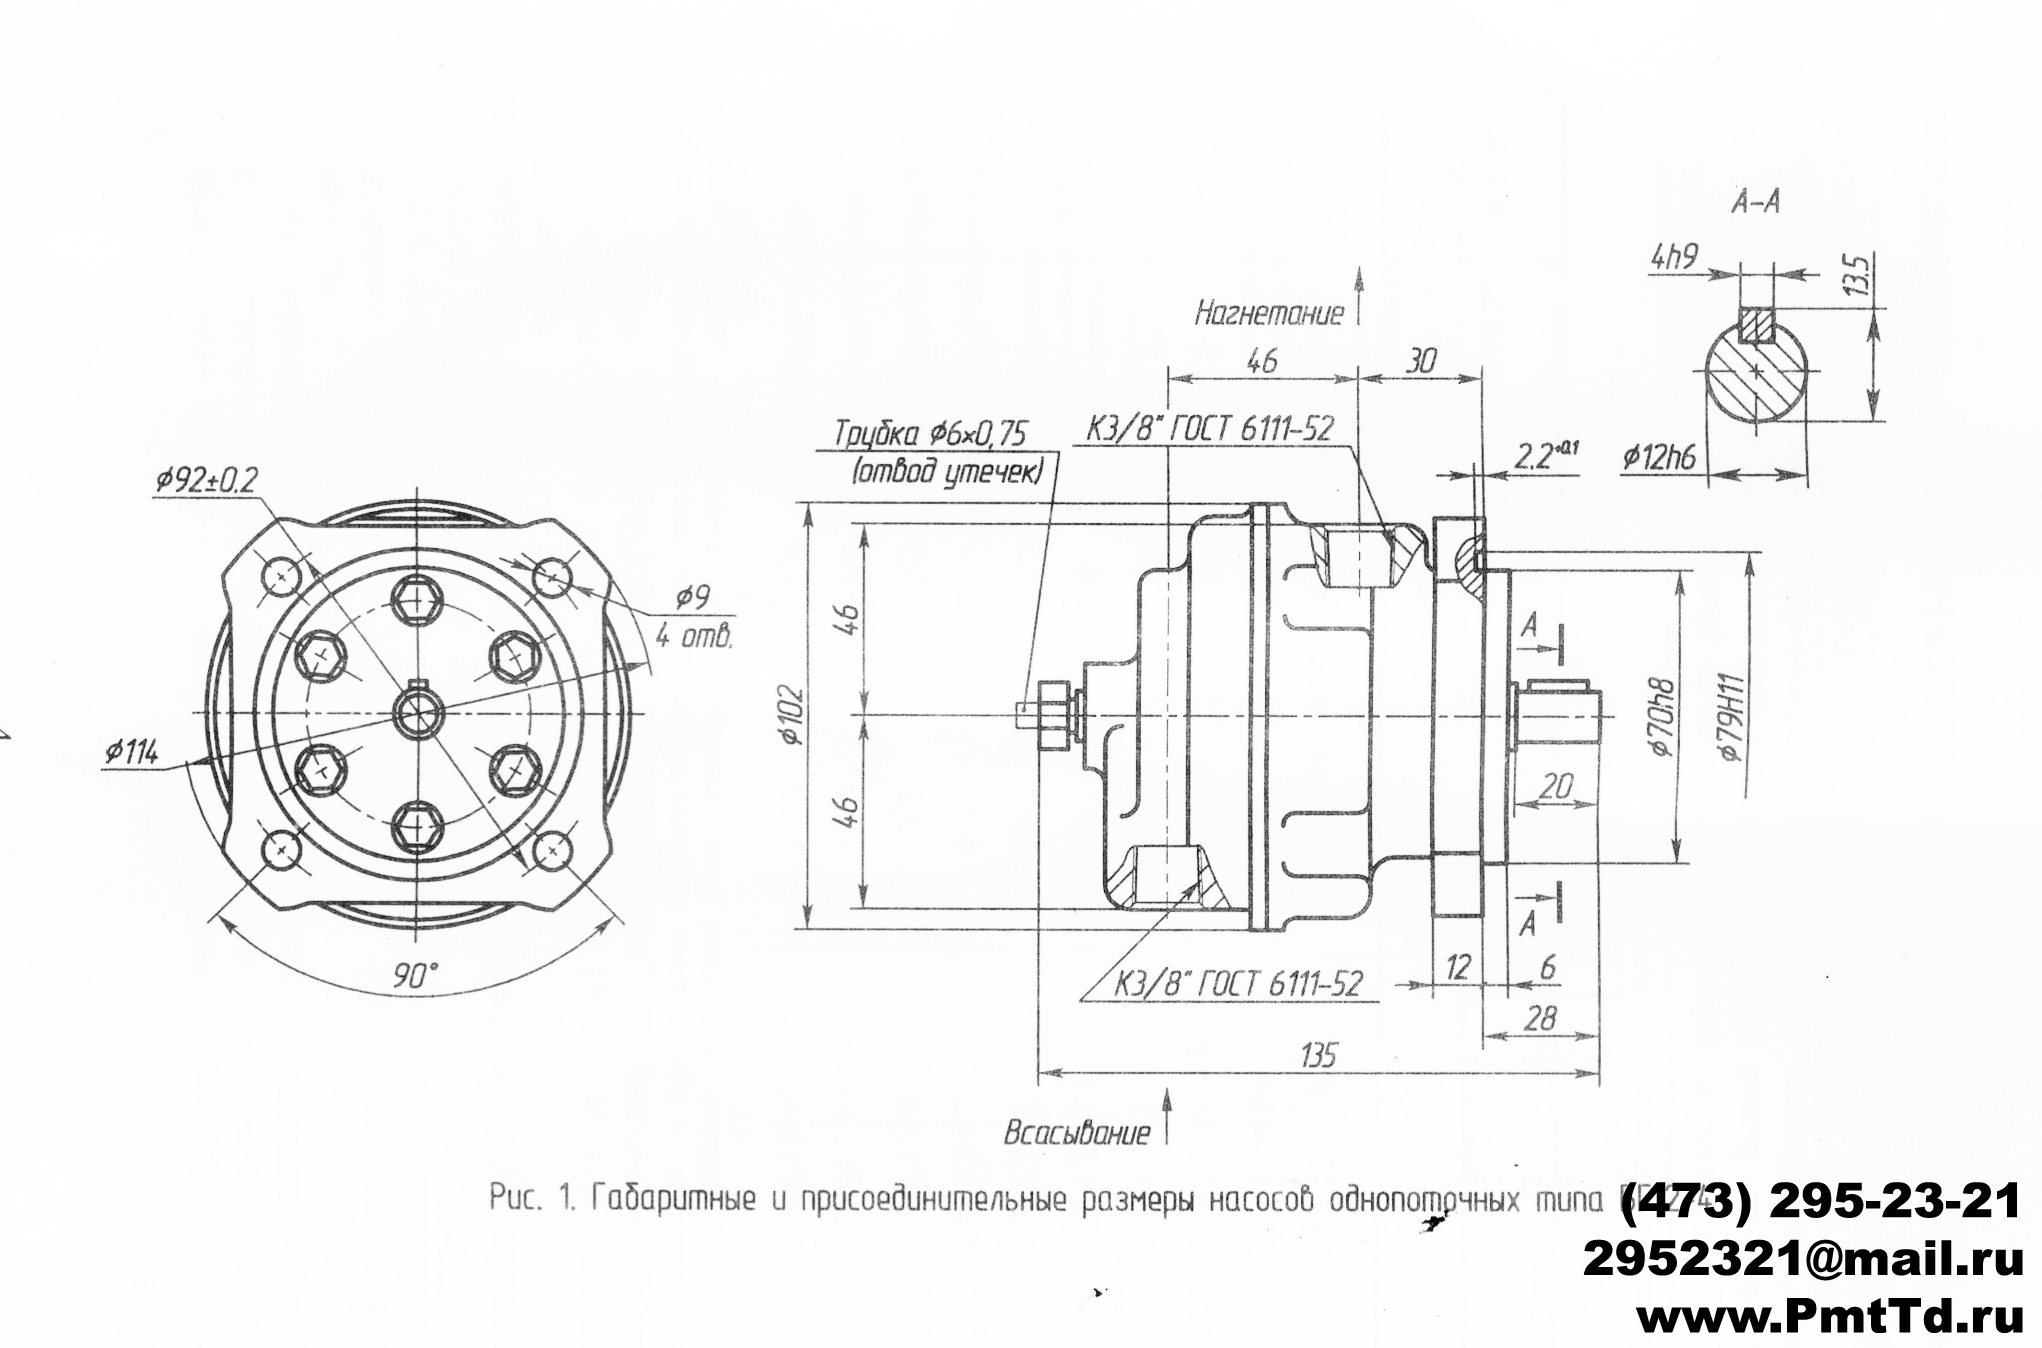 Гидравлические насосы БГ12-41Б, БГ12-41А, БГ12-41, БГ12-42